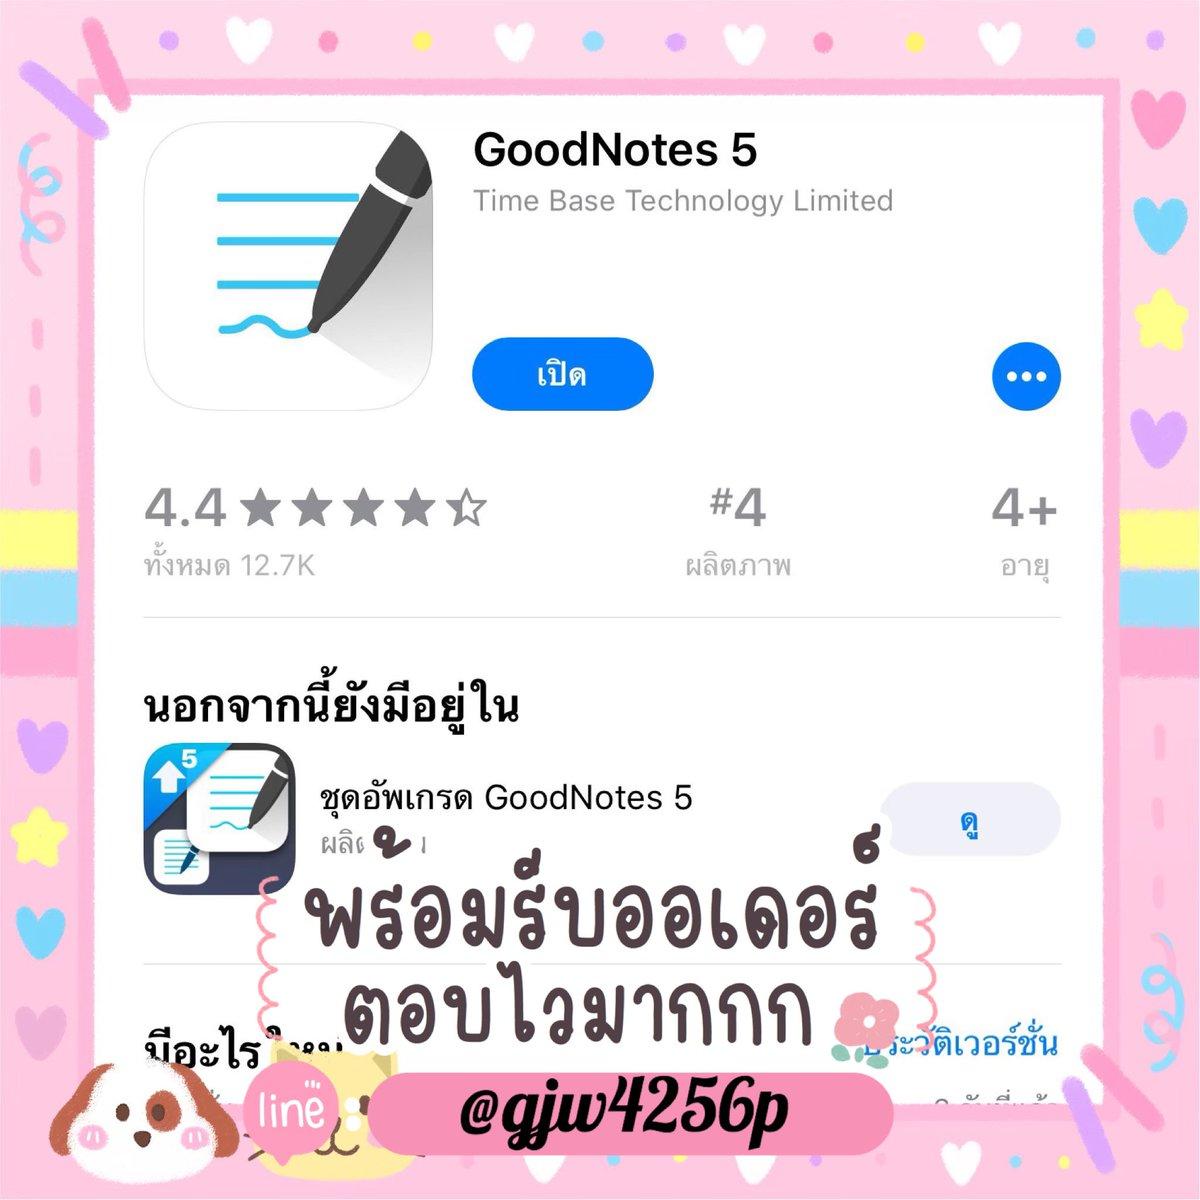 Goodnote5 —40baht—ios— #แอพดีบอกต่อ #goodnote #โน๊ต #แอพ